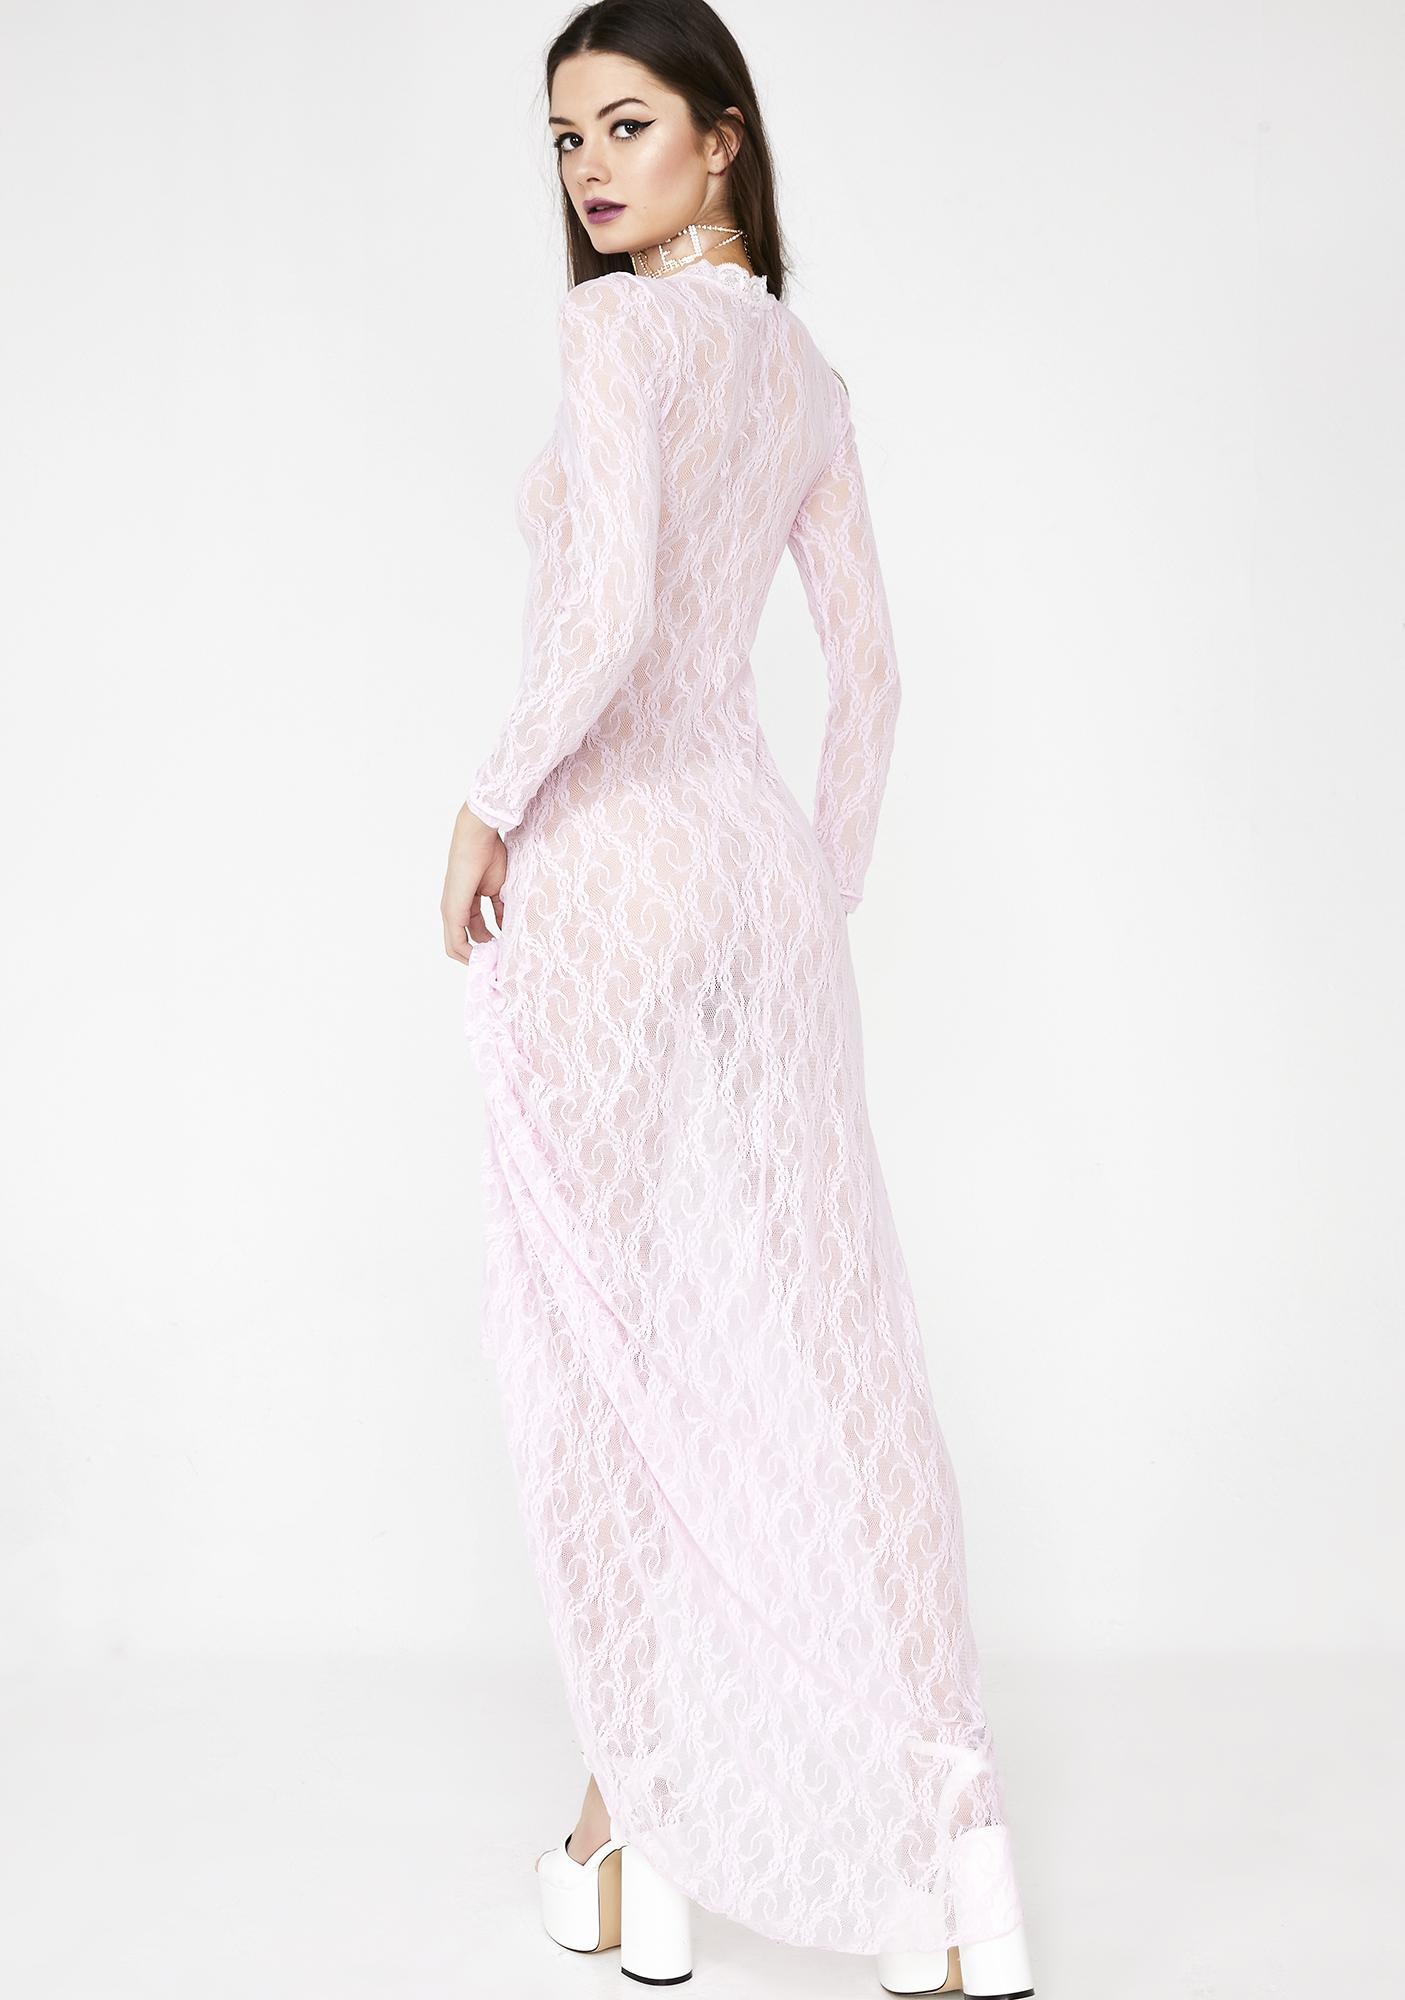 Sweet Treat Lace Dress